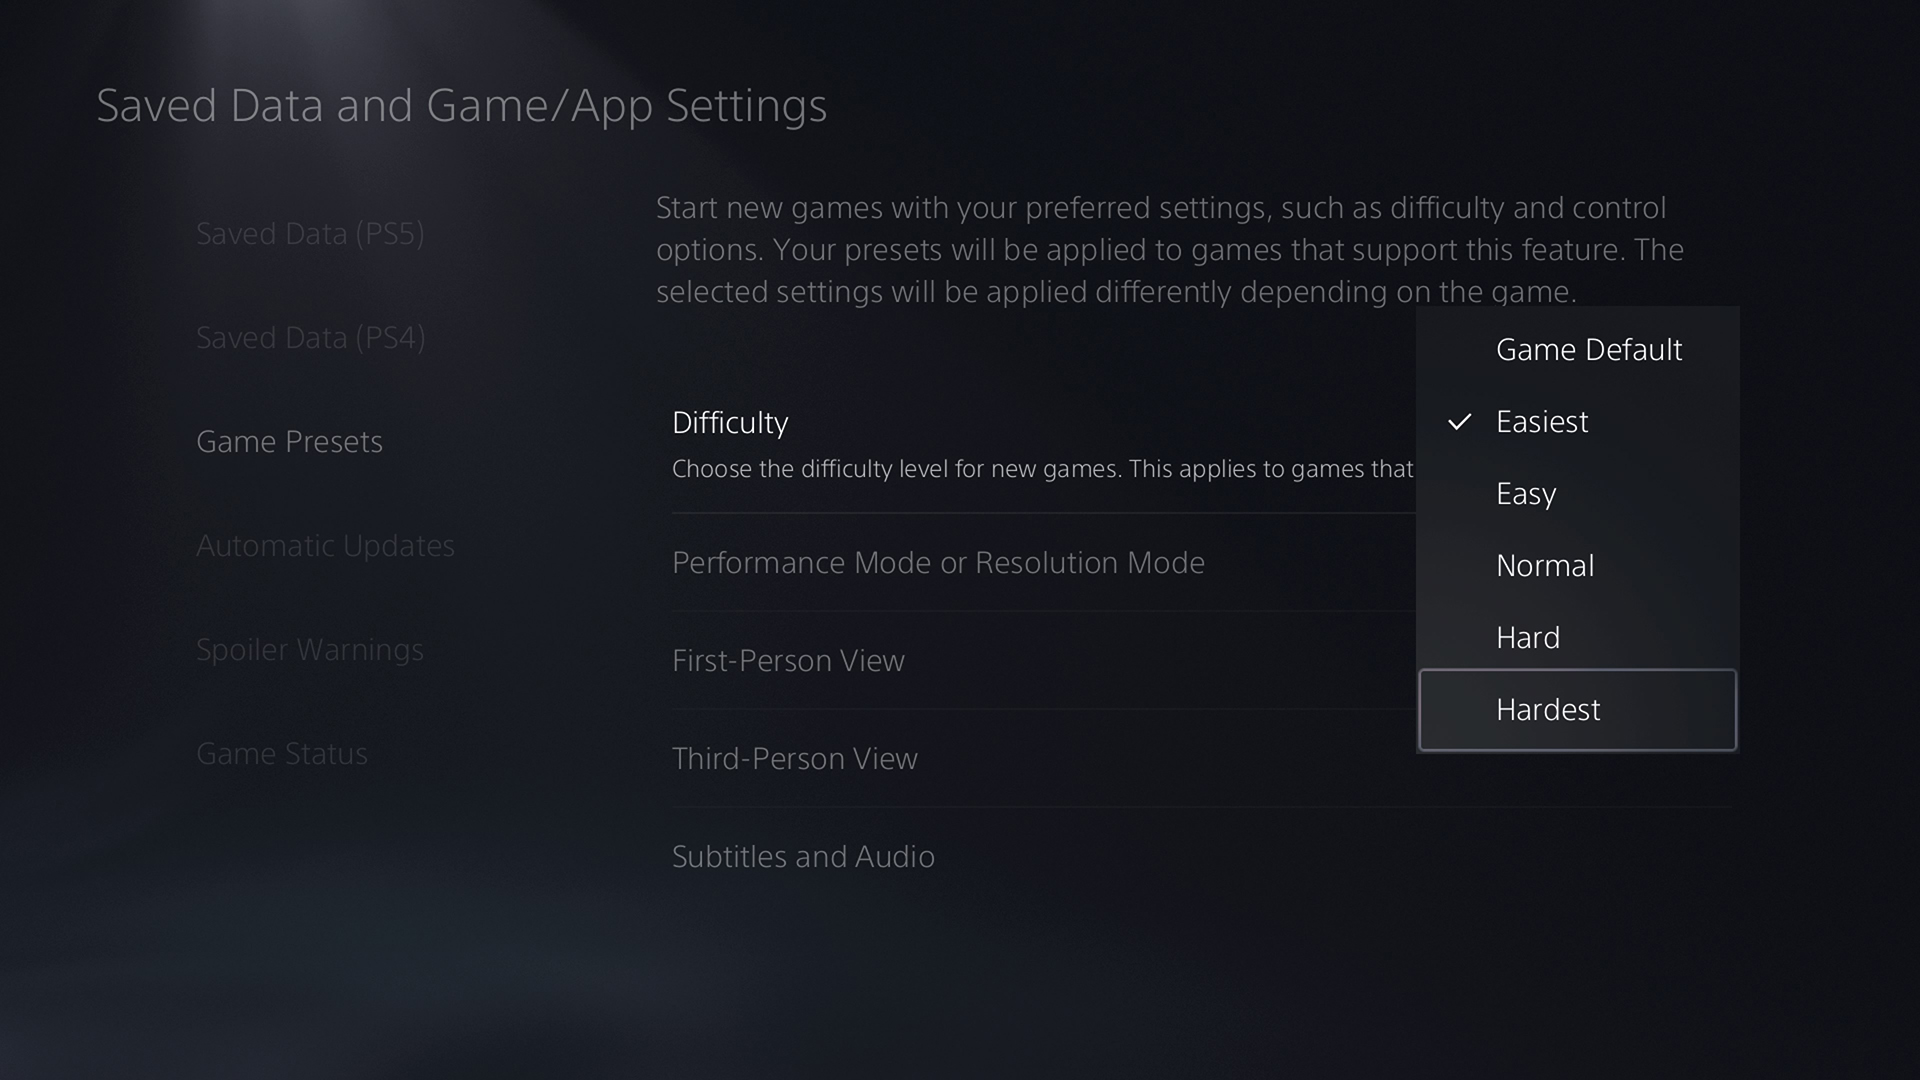 PlayStation 5 ustawienia gry